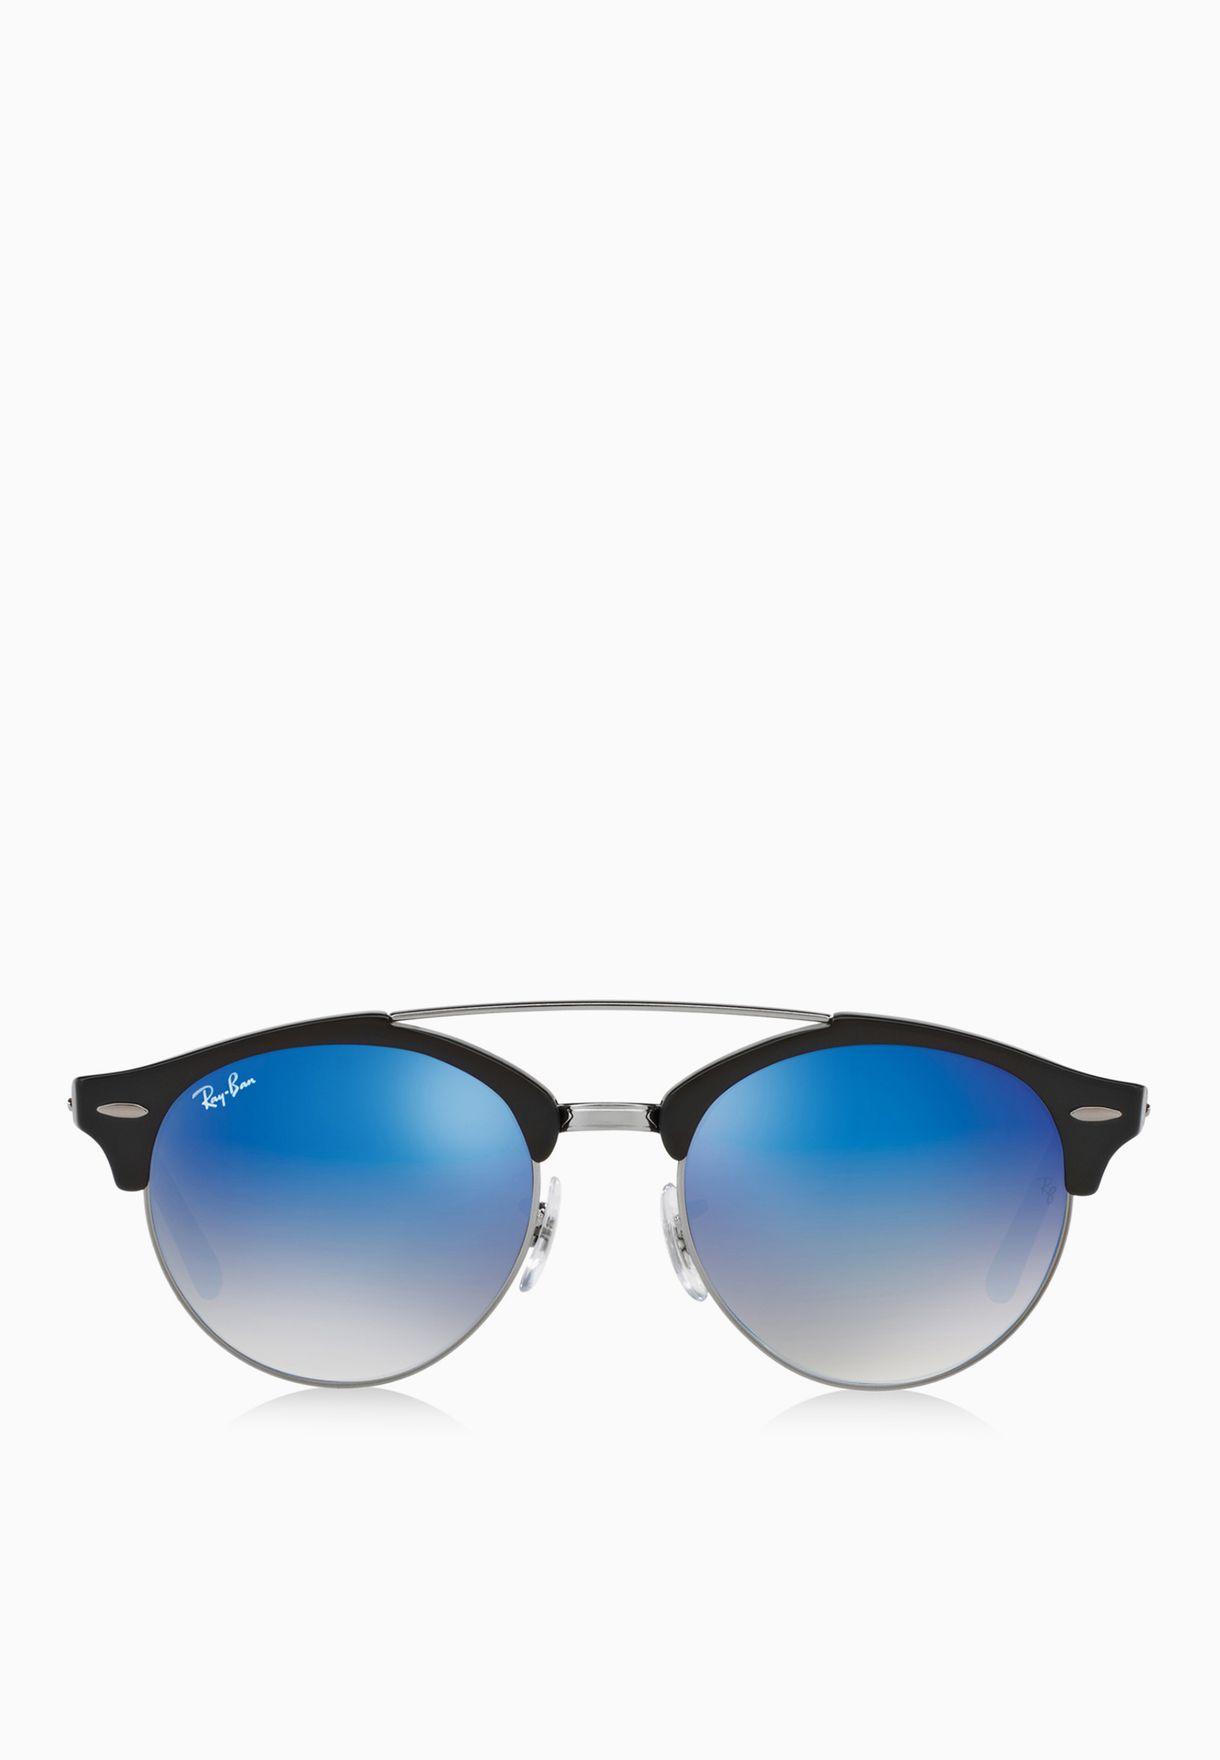 ff1459a9856 ... clearance shop ray ban black clubround double bridge sunglasses for  women in qatar ra736ac40snr 065fb 31846